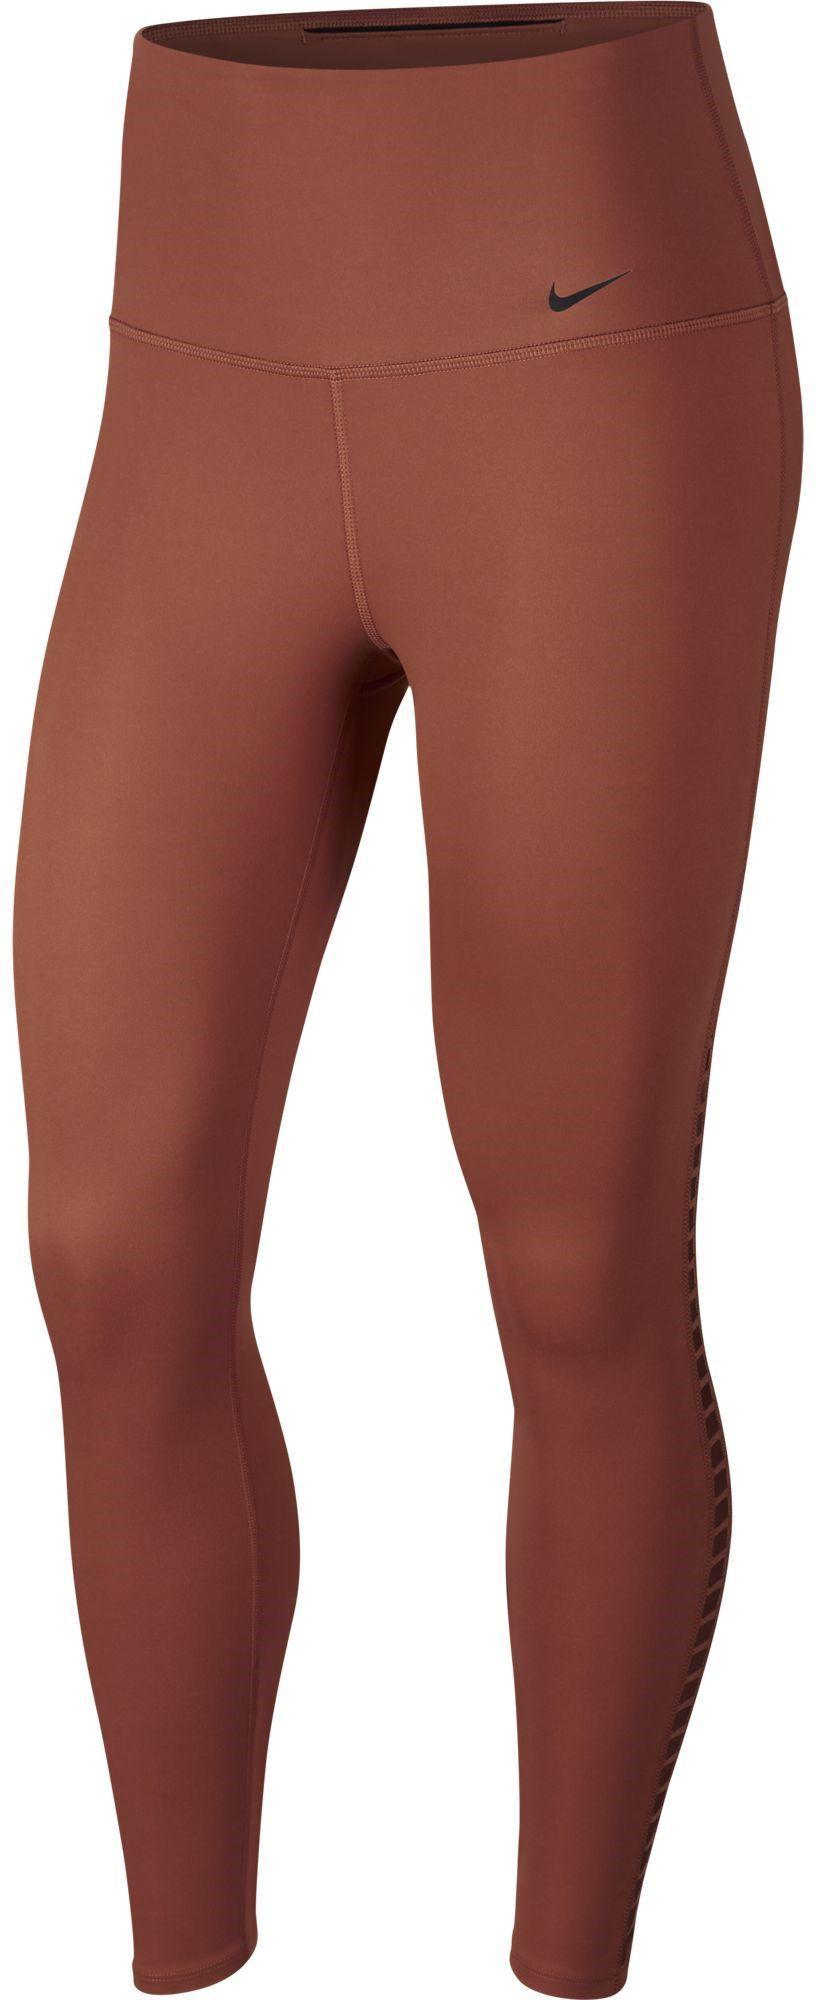 23bfbea53e931 Nike. Women's Dri-fit Power 7/8 Training Legging